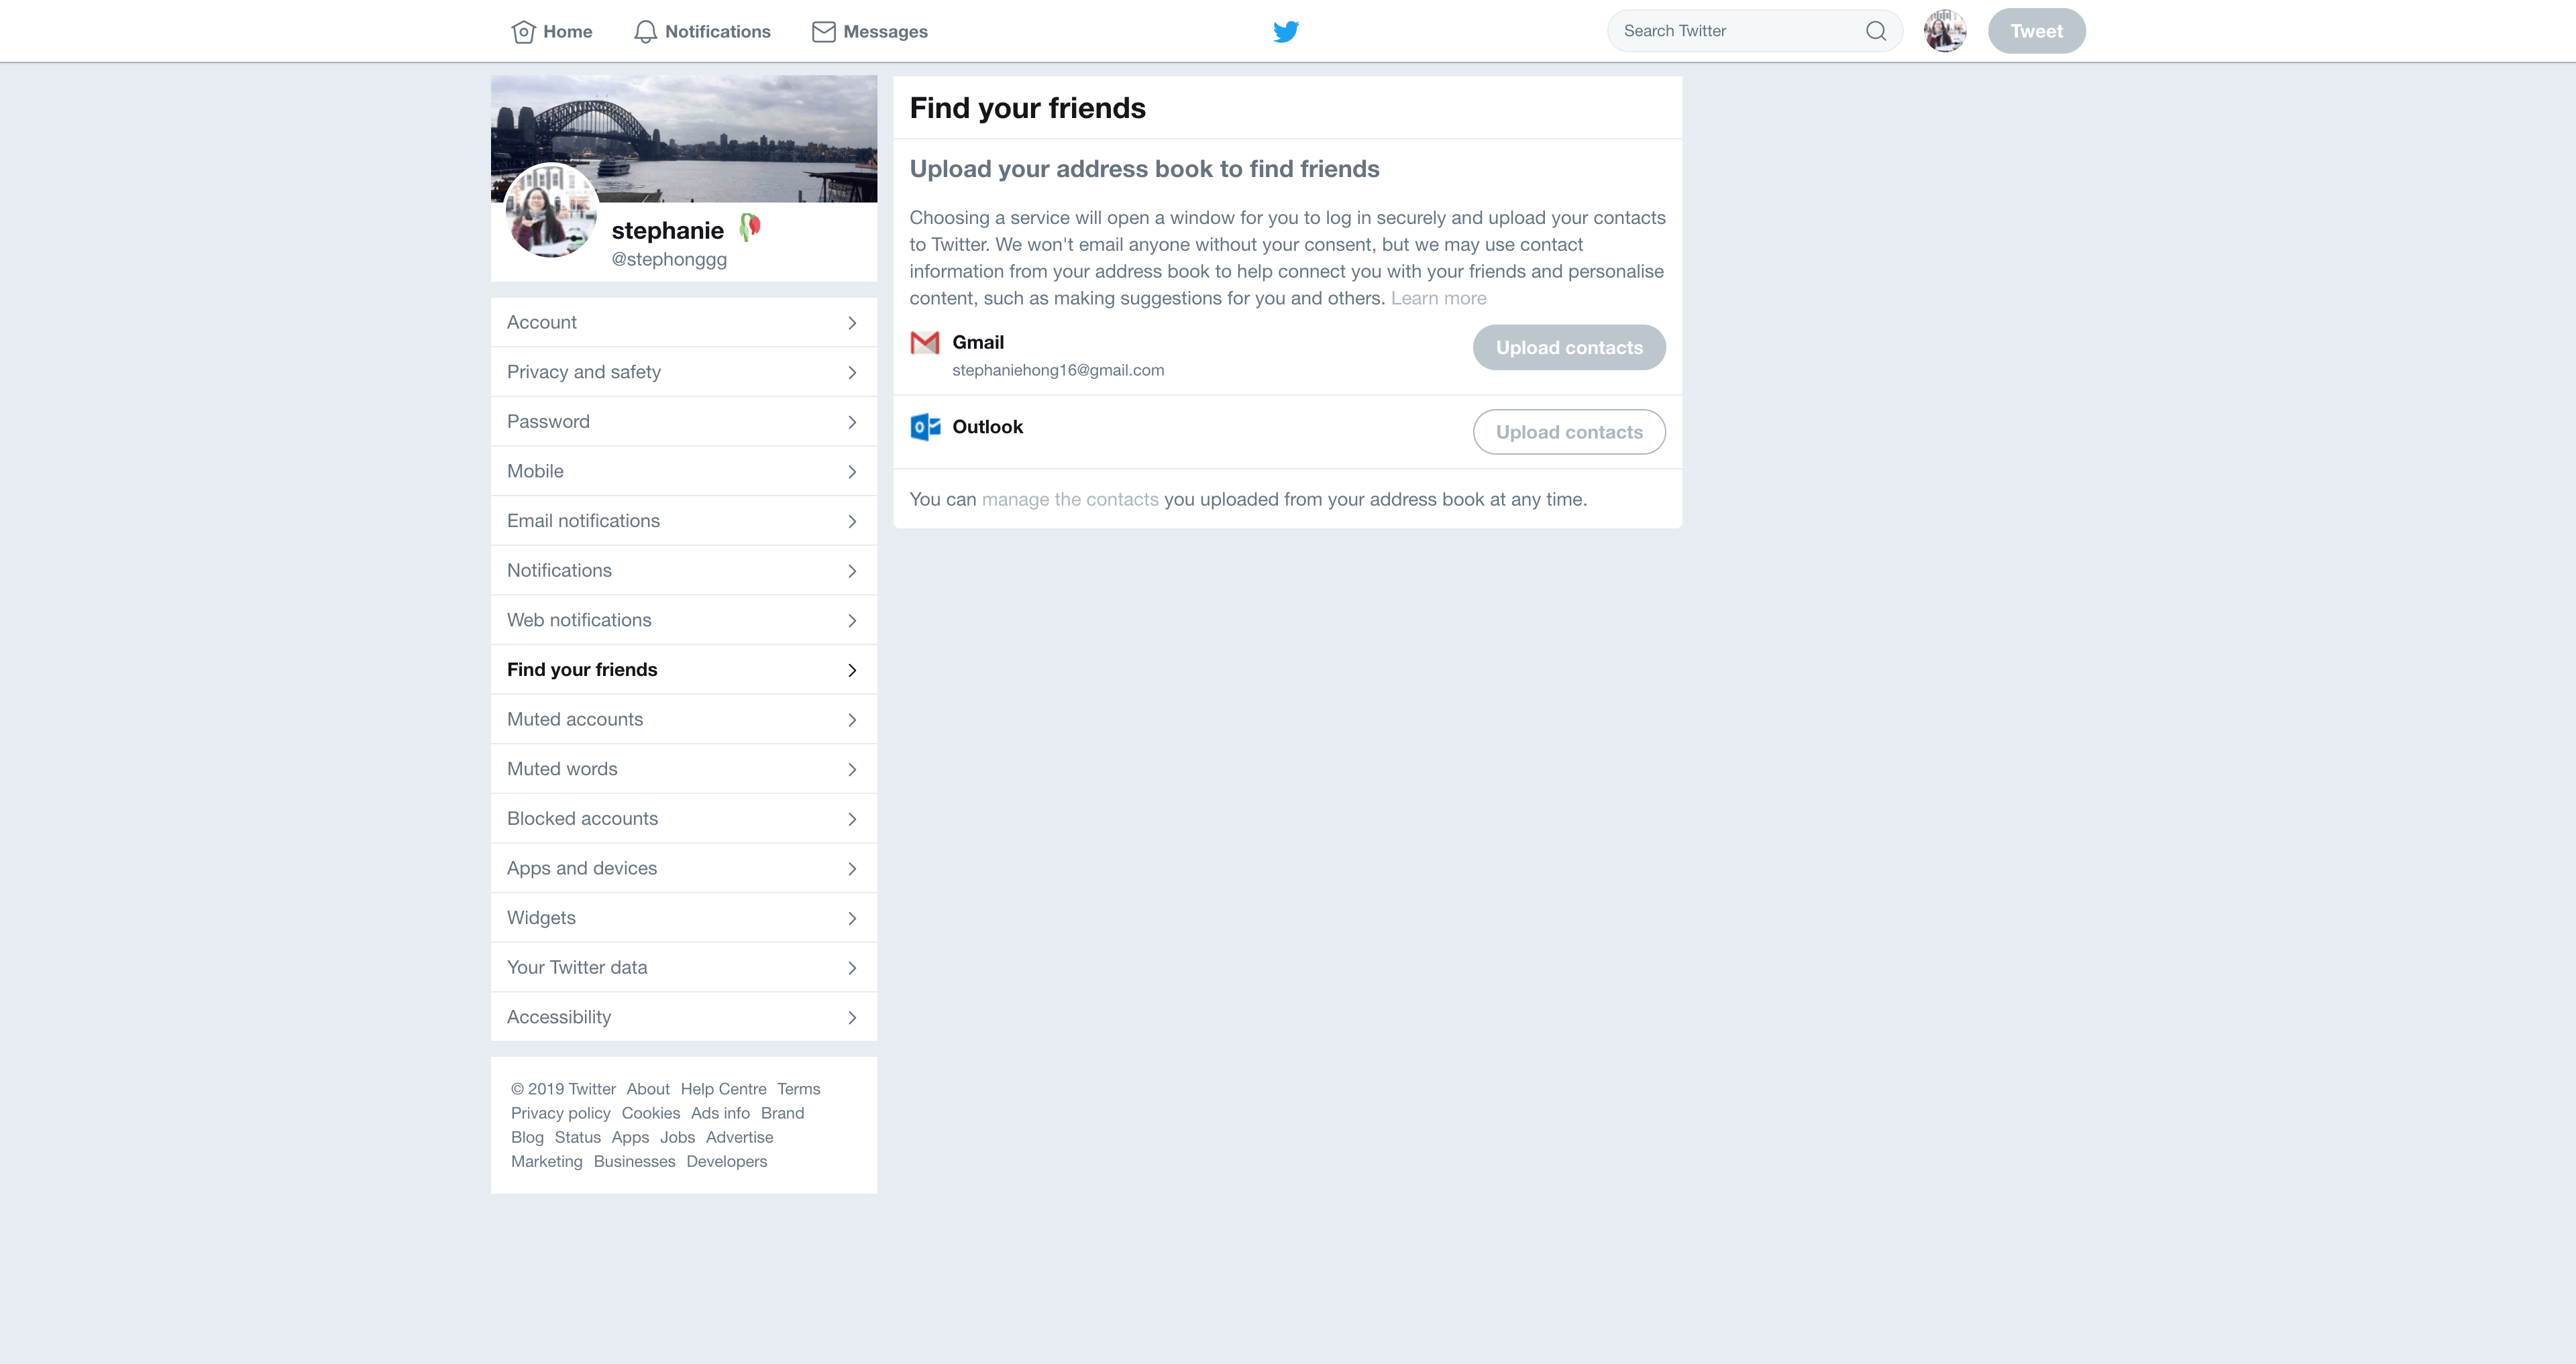 Friends Finding Settings by Twitter